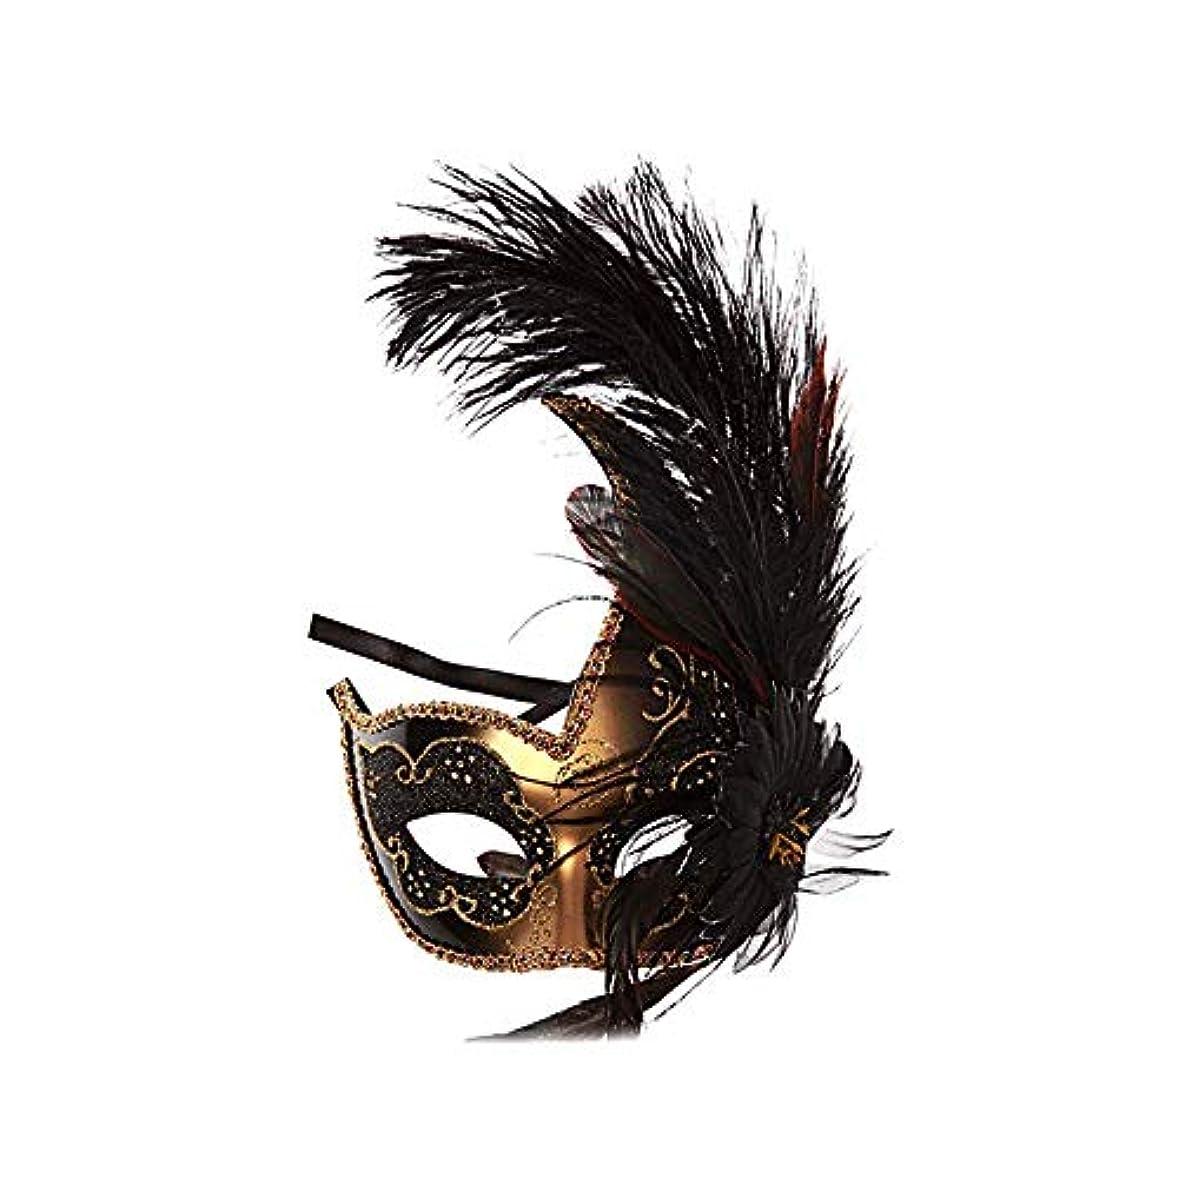 Nanle ハロウィンマスクハーフフェザーマスクベニスプリンセスマスク美容レース仮面ライダーコスプレ (色 : Style B black)